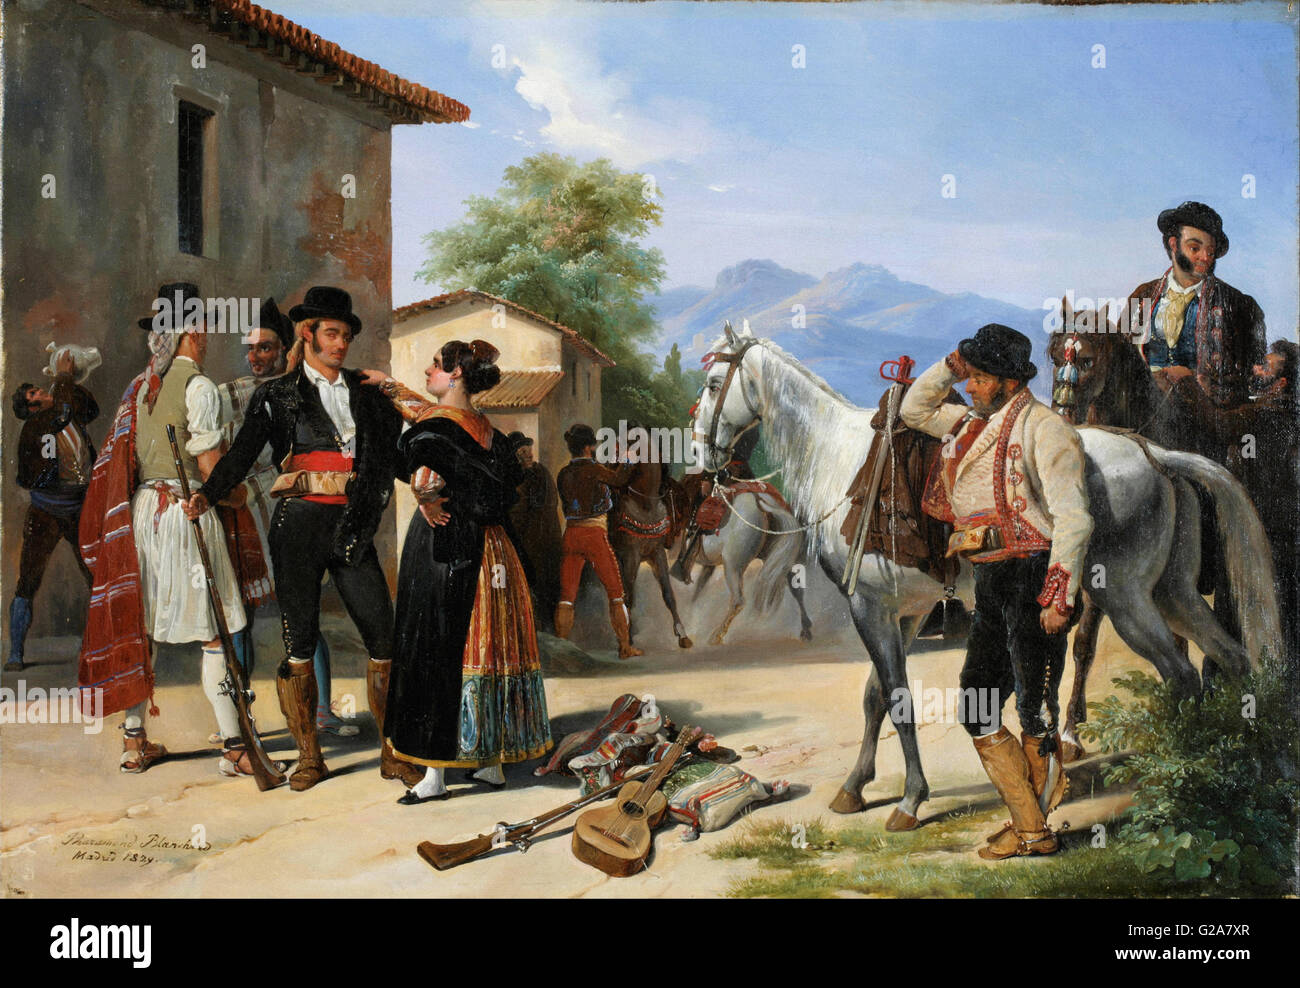 Henri Pierre Léon Pharamond Blanchard - The Smugglers - Museo del Romanticismo, Madrid Stock Photo